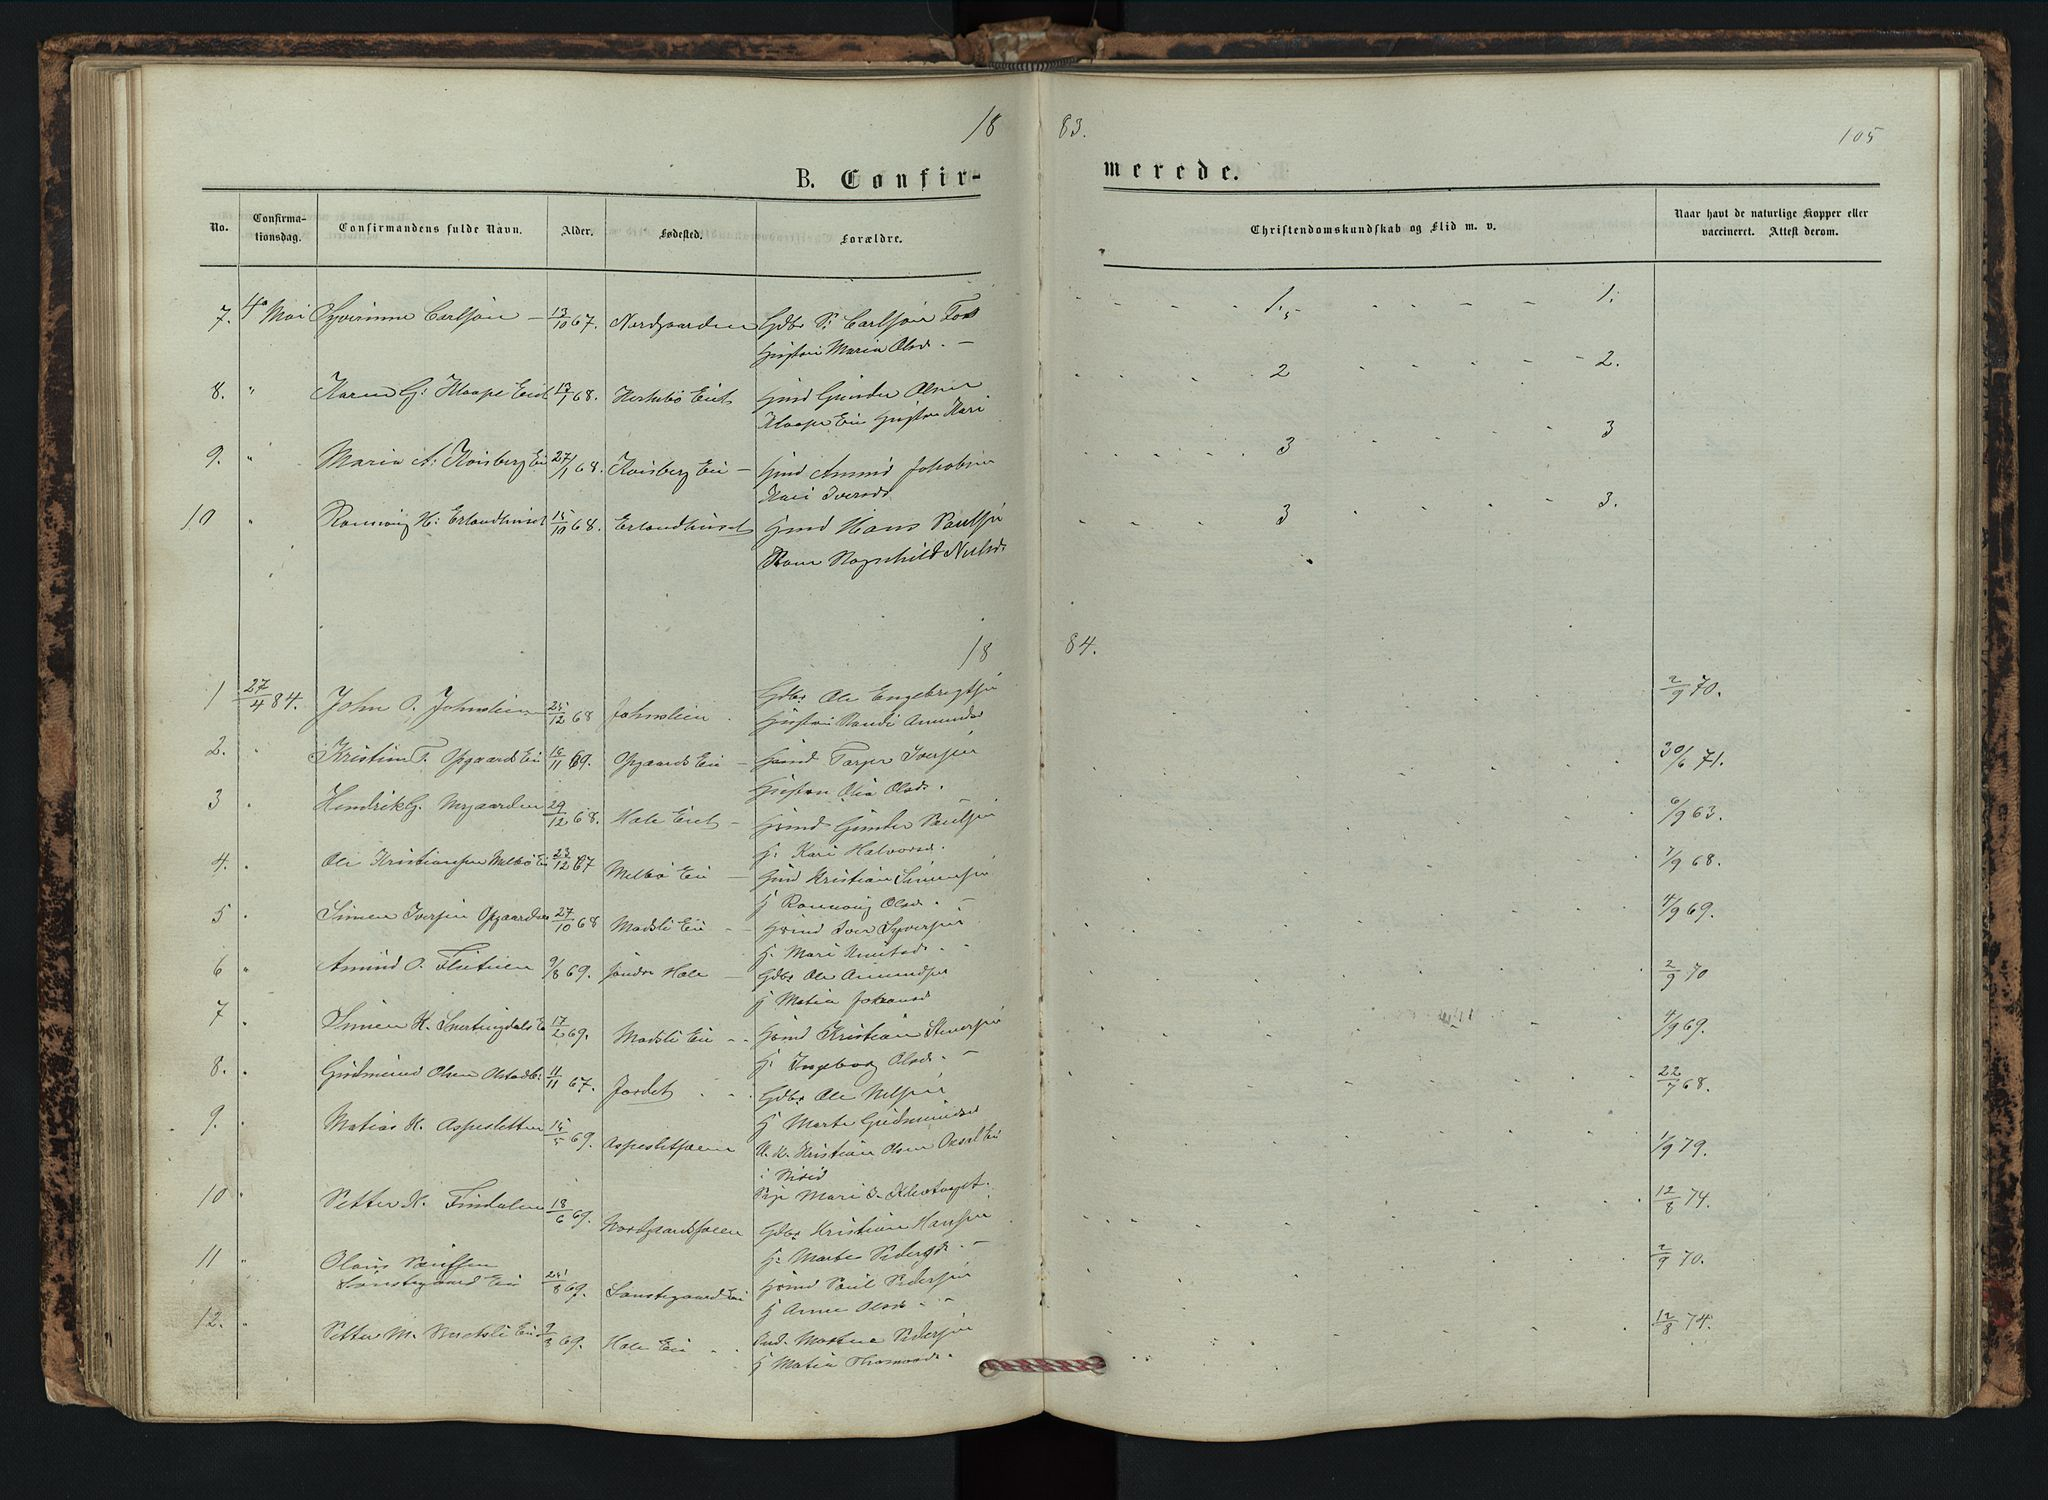 SAH, Vestre Gausdal prestekontor, Klokkerbok nr. 2, 1874-1897, s. 105